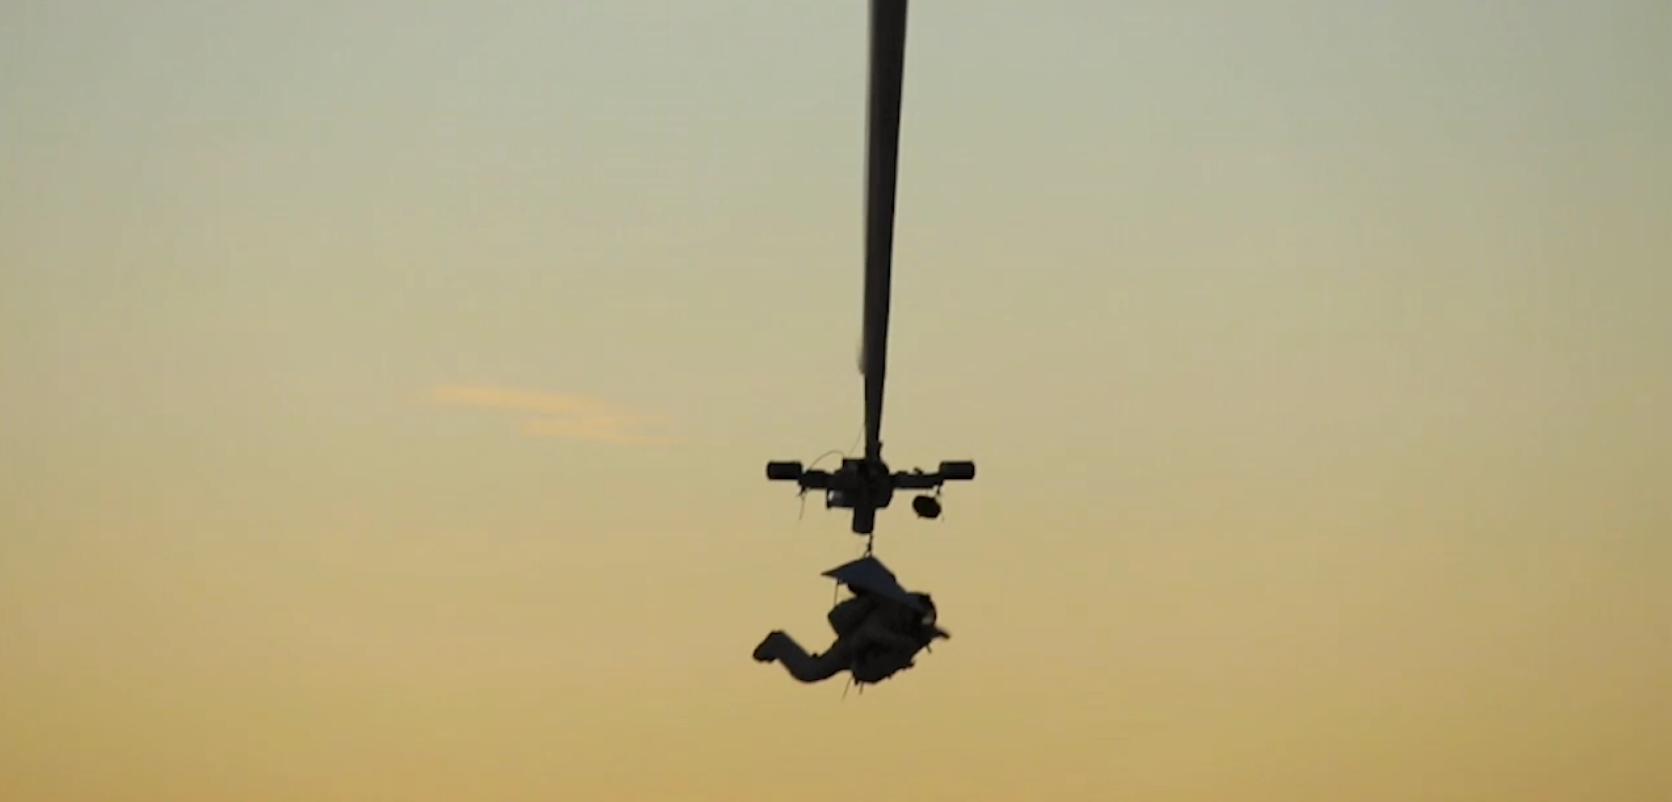 Old Rich Google Man Already Beat Felix Baumgartner's Space Jump Record